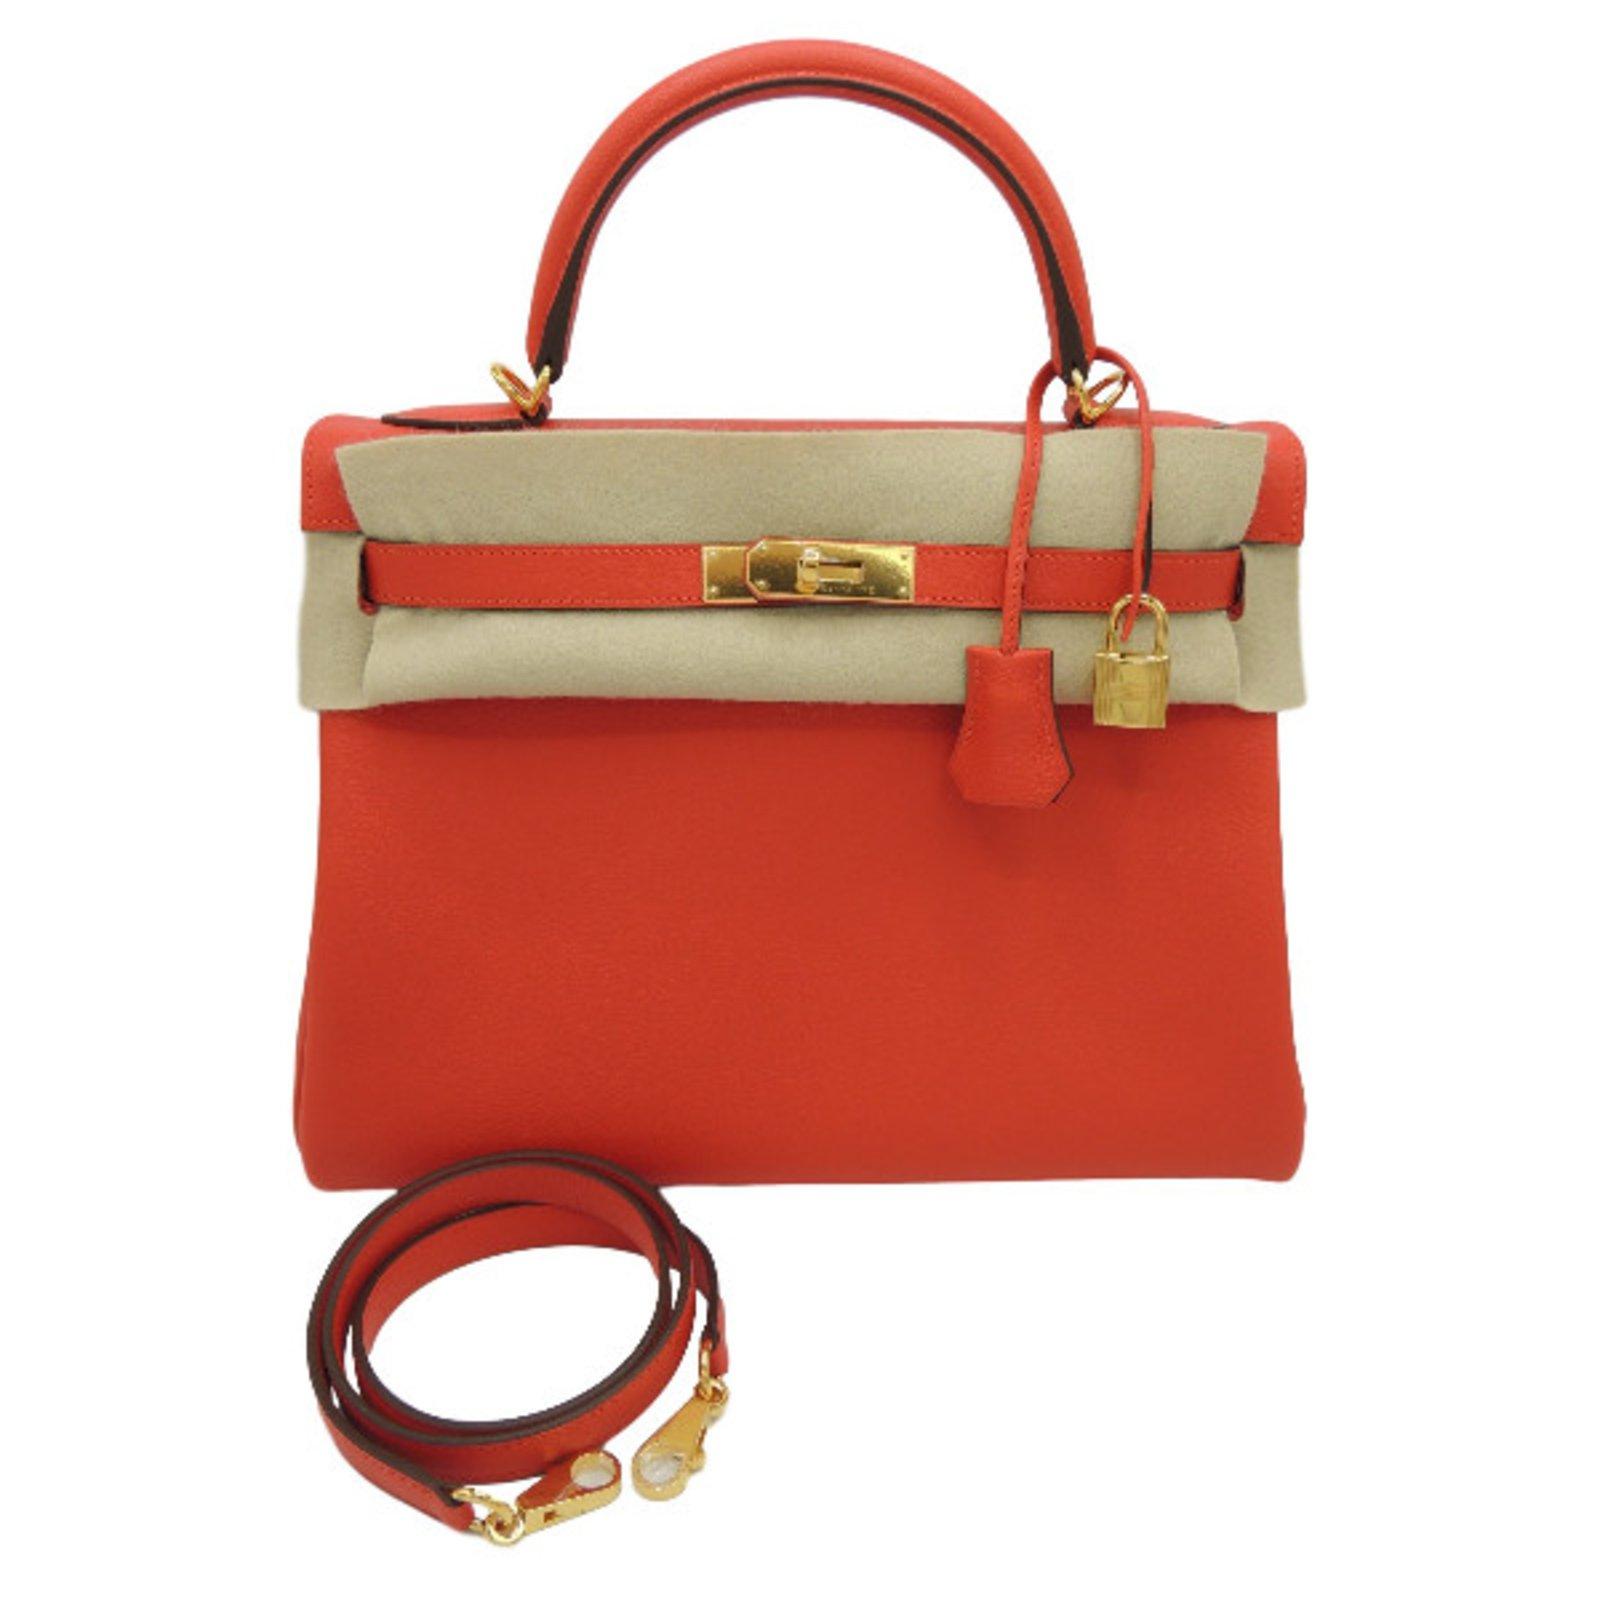 af1d219370f3 france hermès cross body bag 1fbaf 8e40e  discount code for hermès kelly 32  evercolor handbags leather red ref.34670 80322 71887